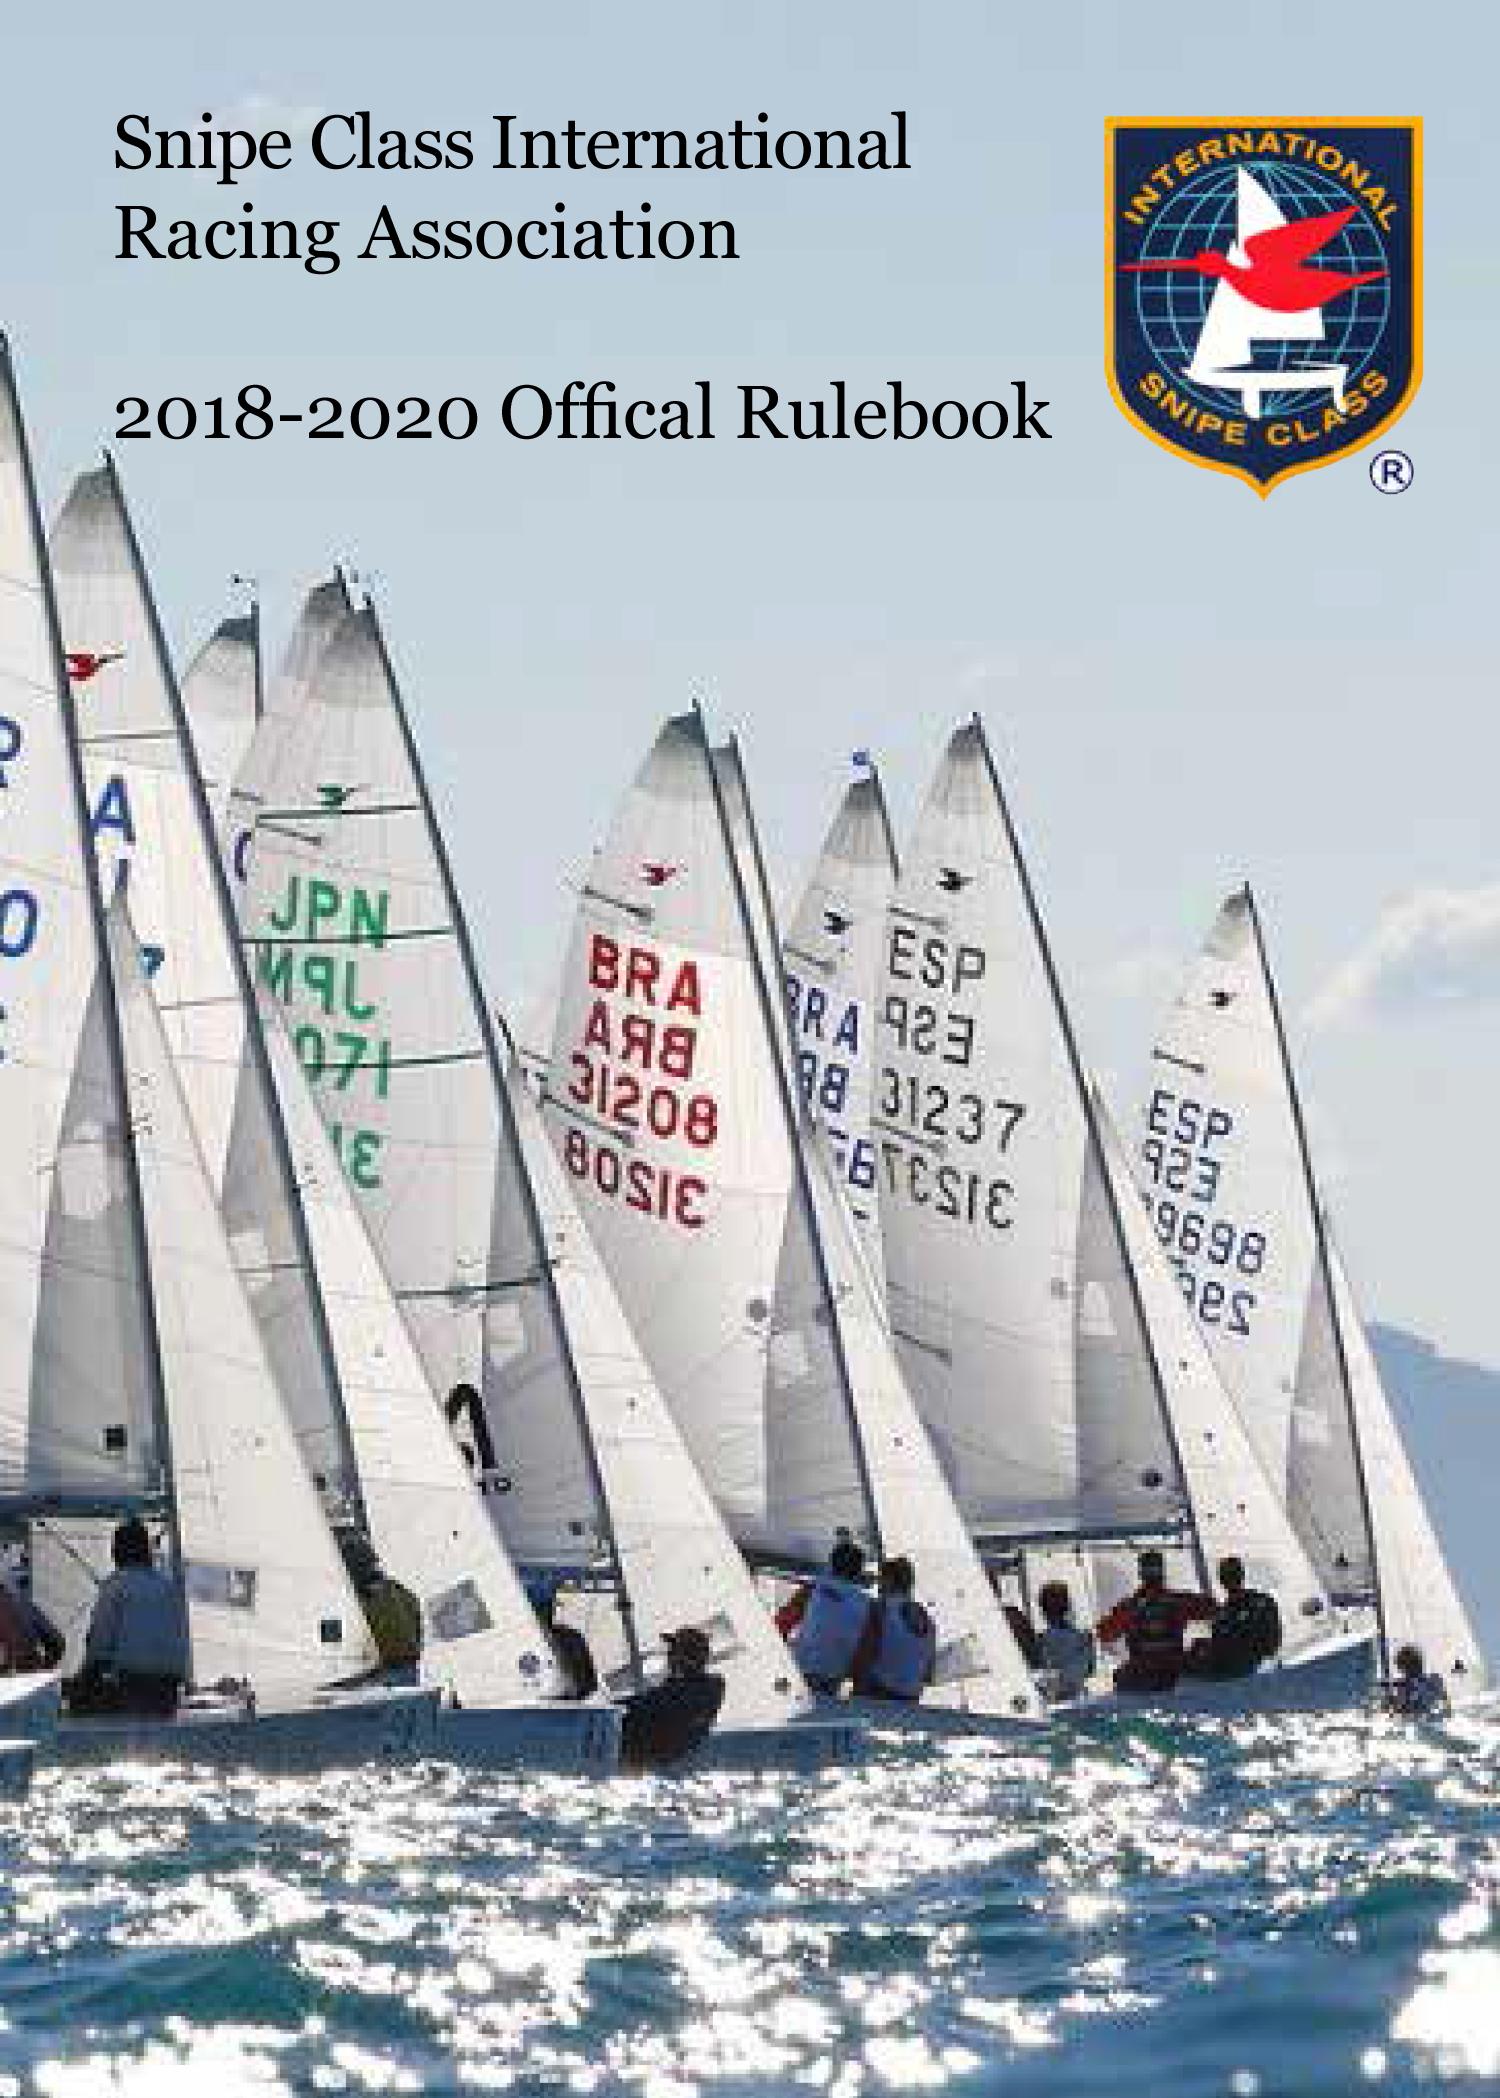 2018 2020SnipeRulebookDIGITAL Cover1